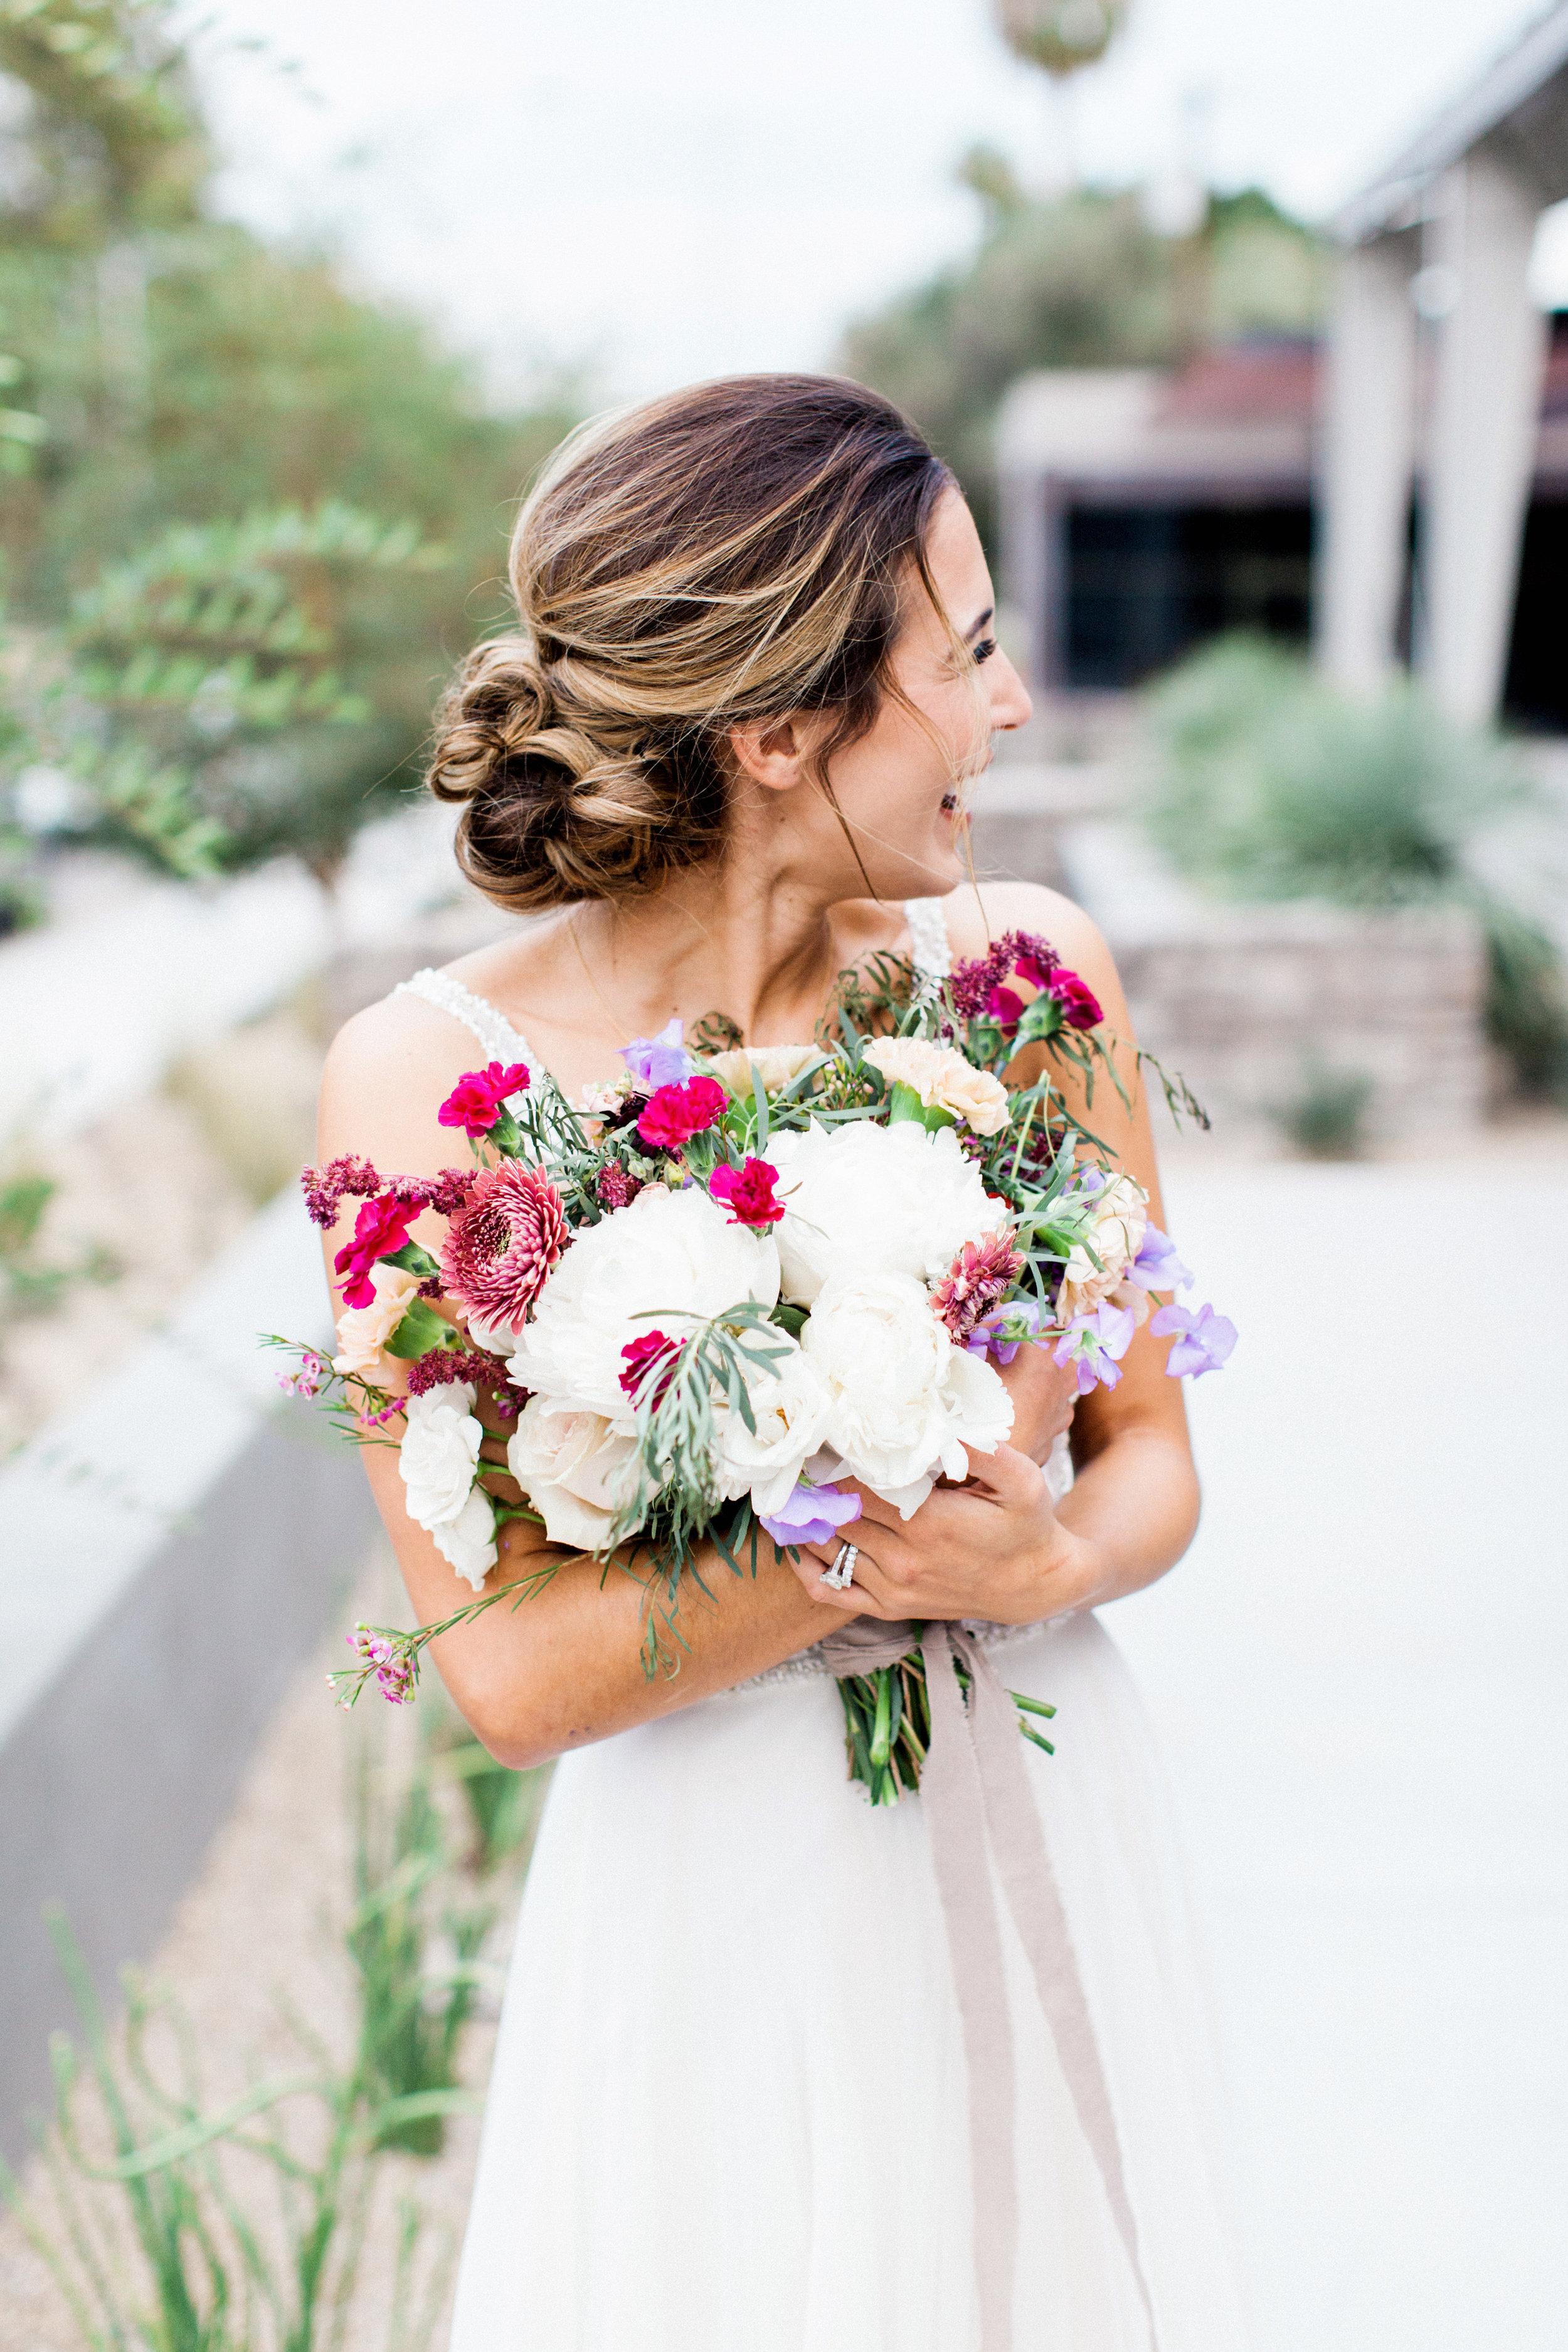 Mauve and Lavender Modern Wedding Inspiration - Bridal Style